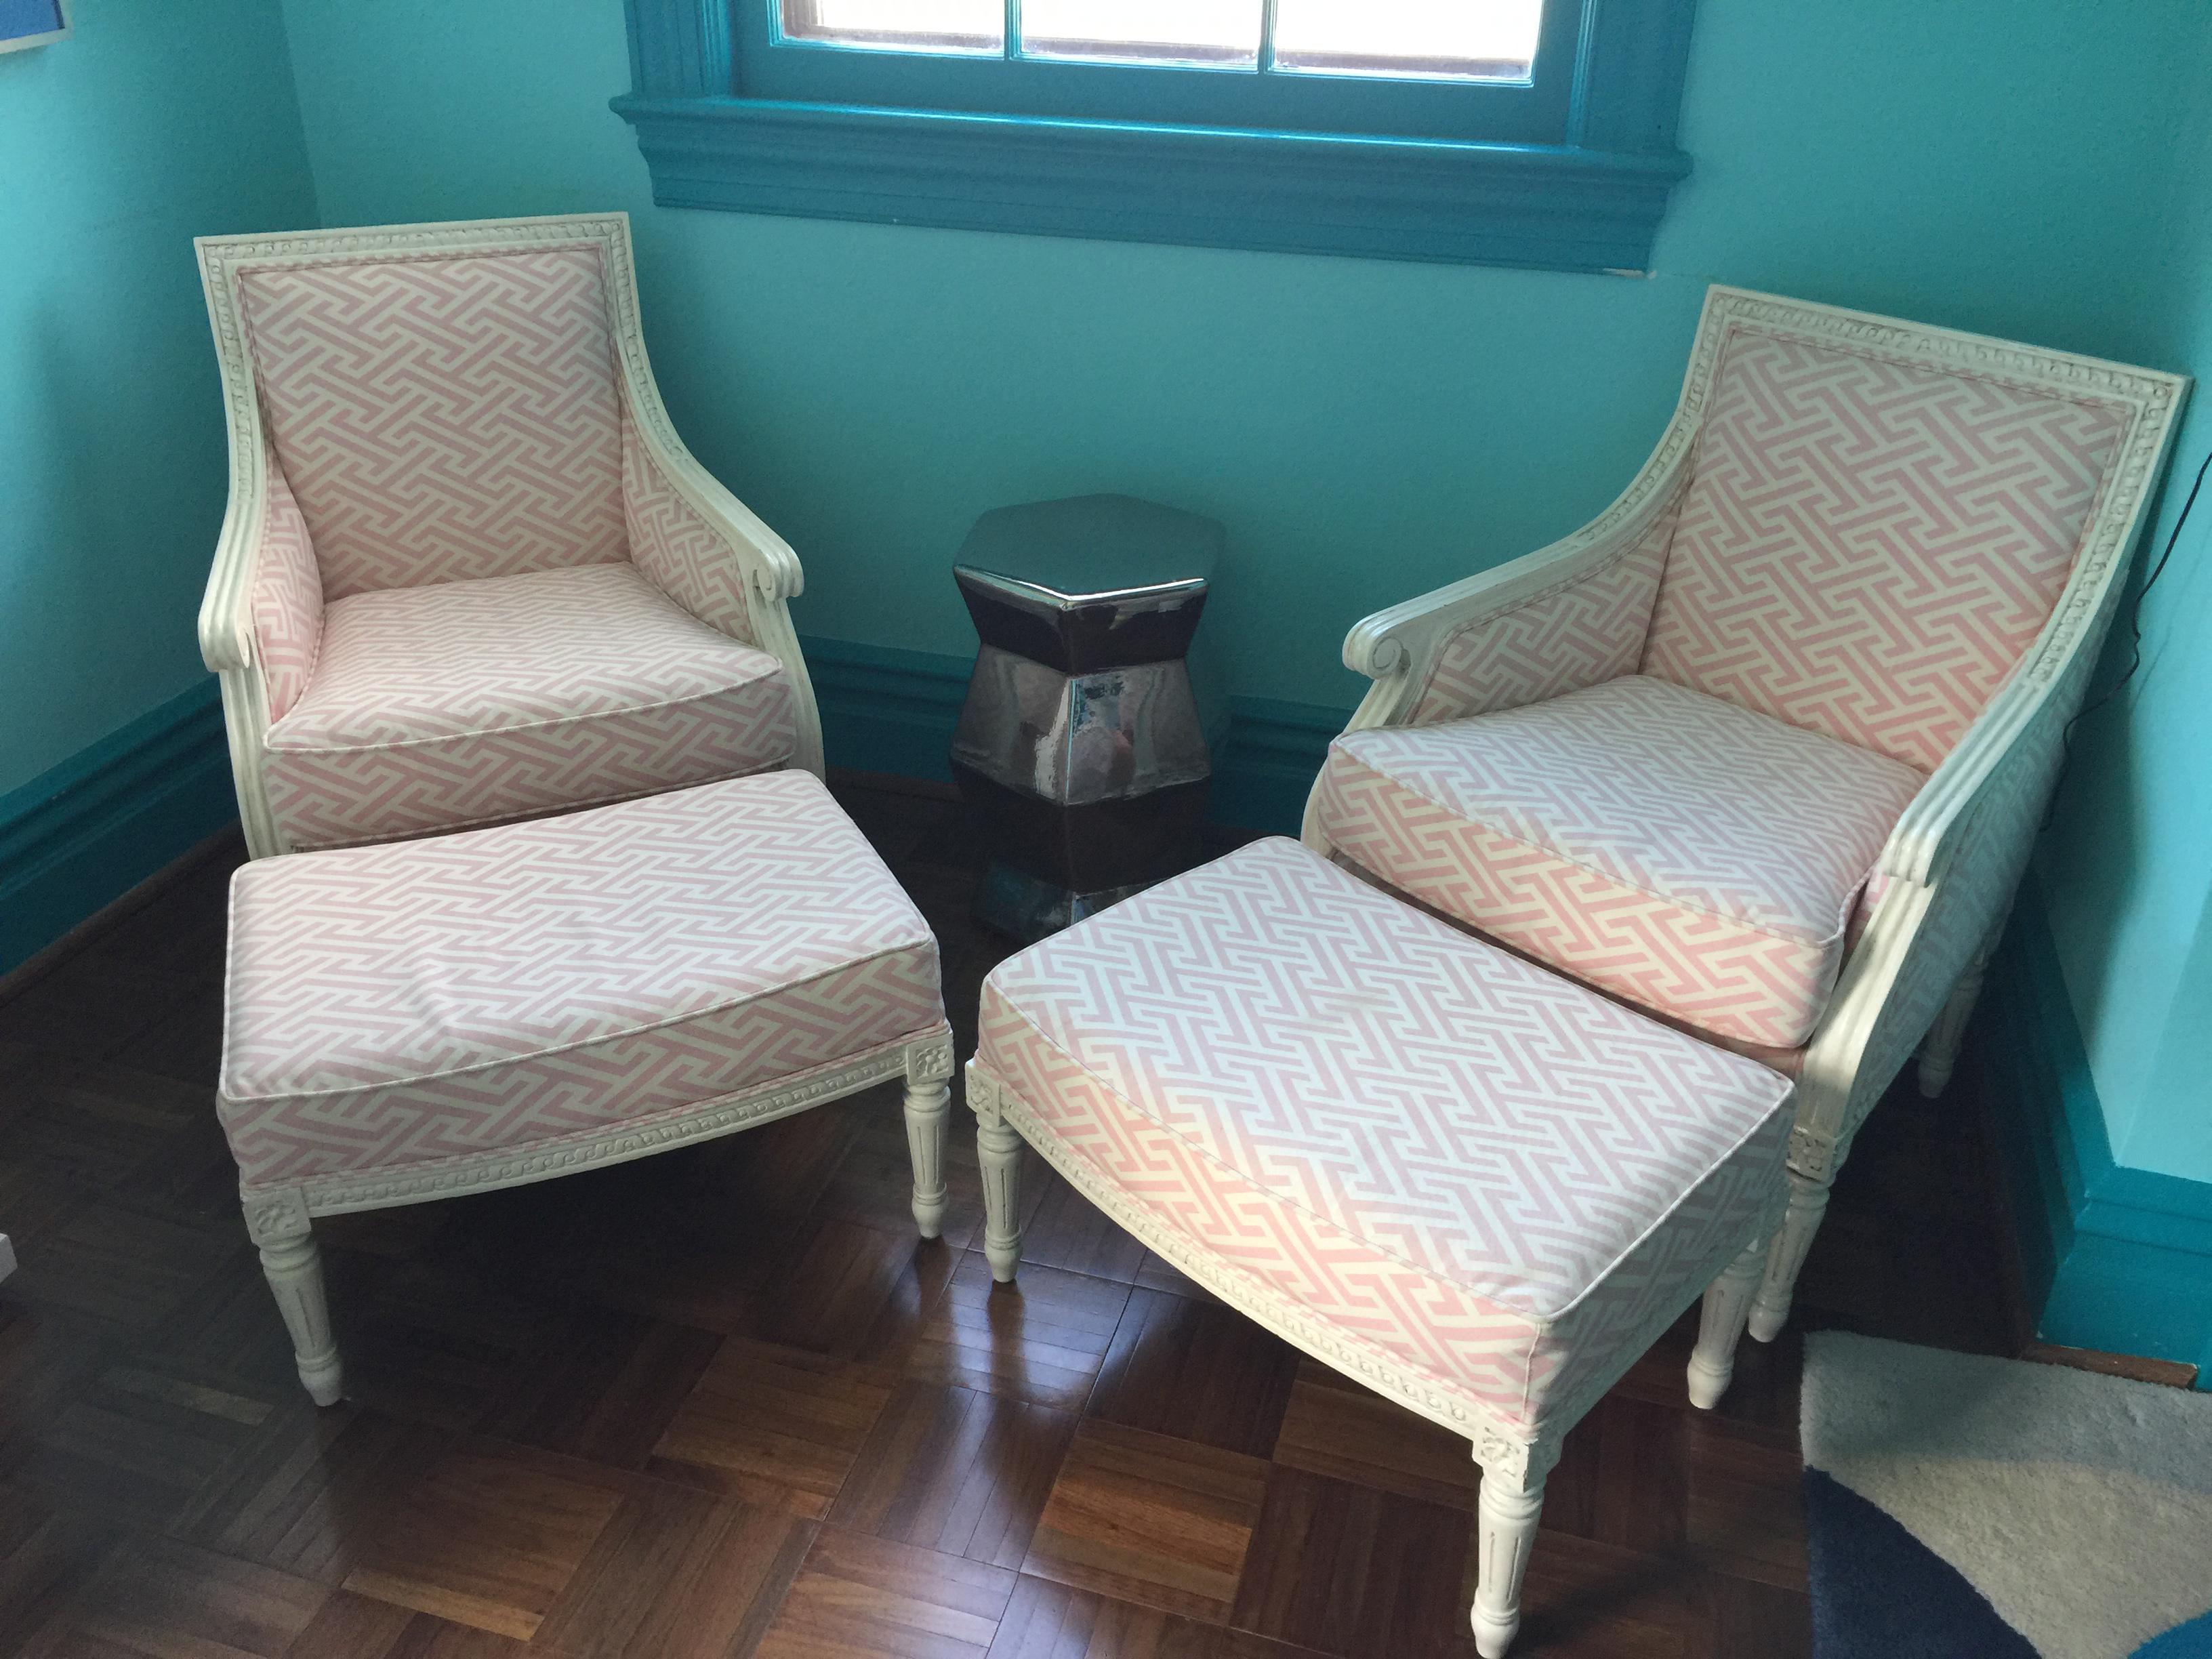 Superior Oly Studio Hanna Chair U0026 Ottoman Set   A Pair   Image 2 ...